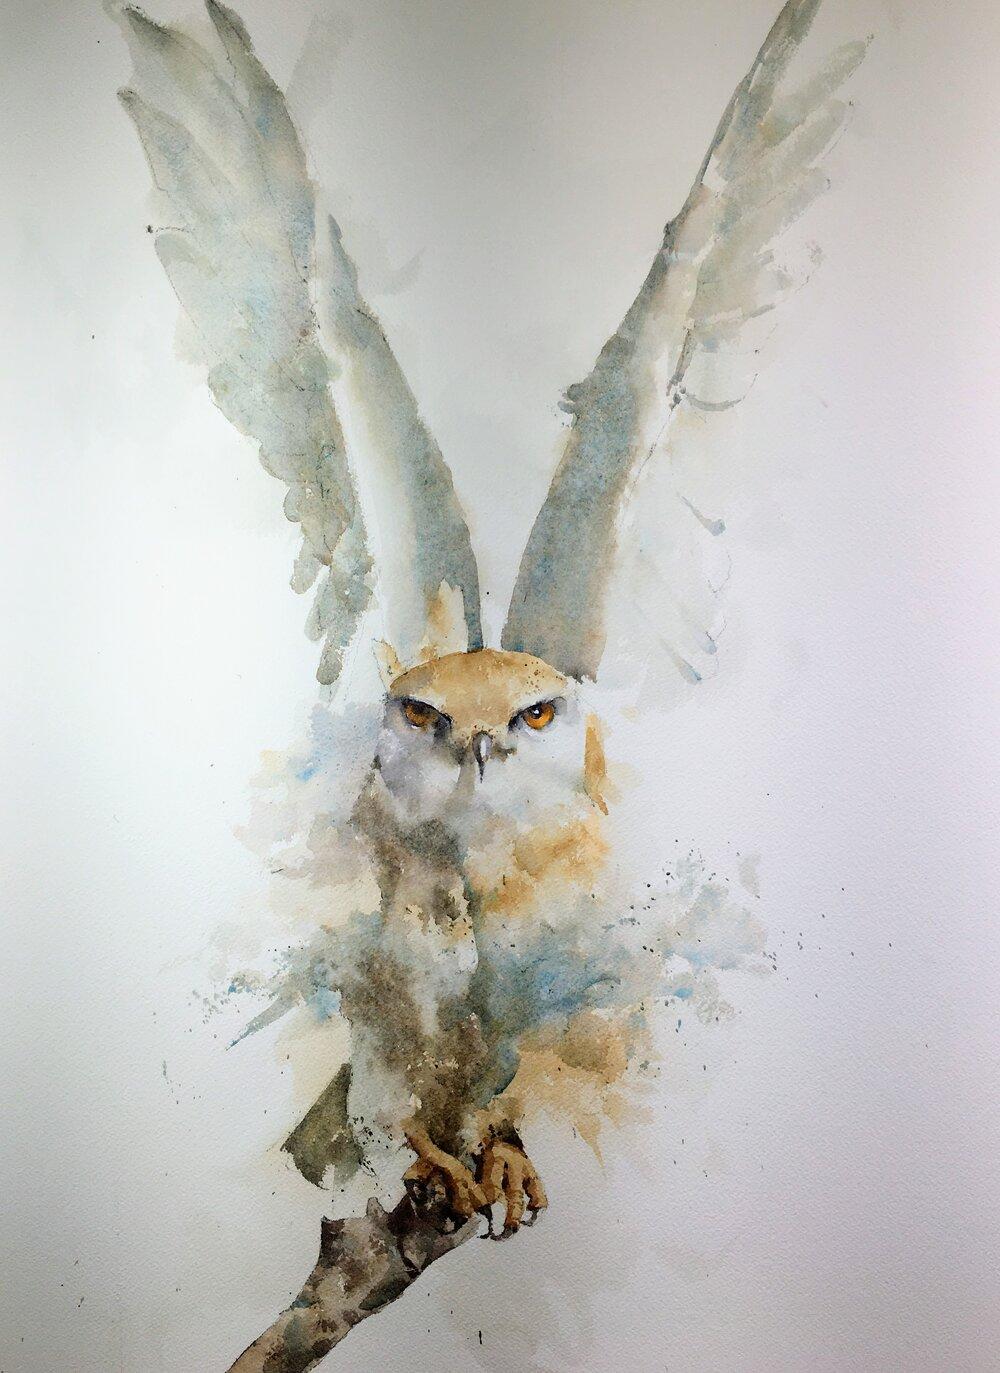 kite-watercolor-painting